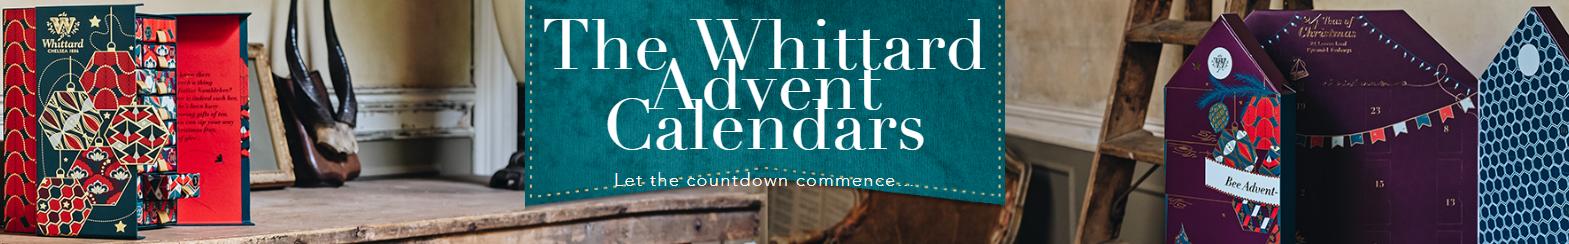 Advent Calendars for Christmas 2019